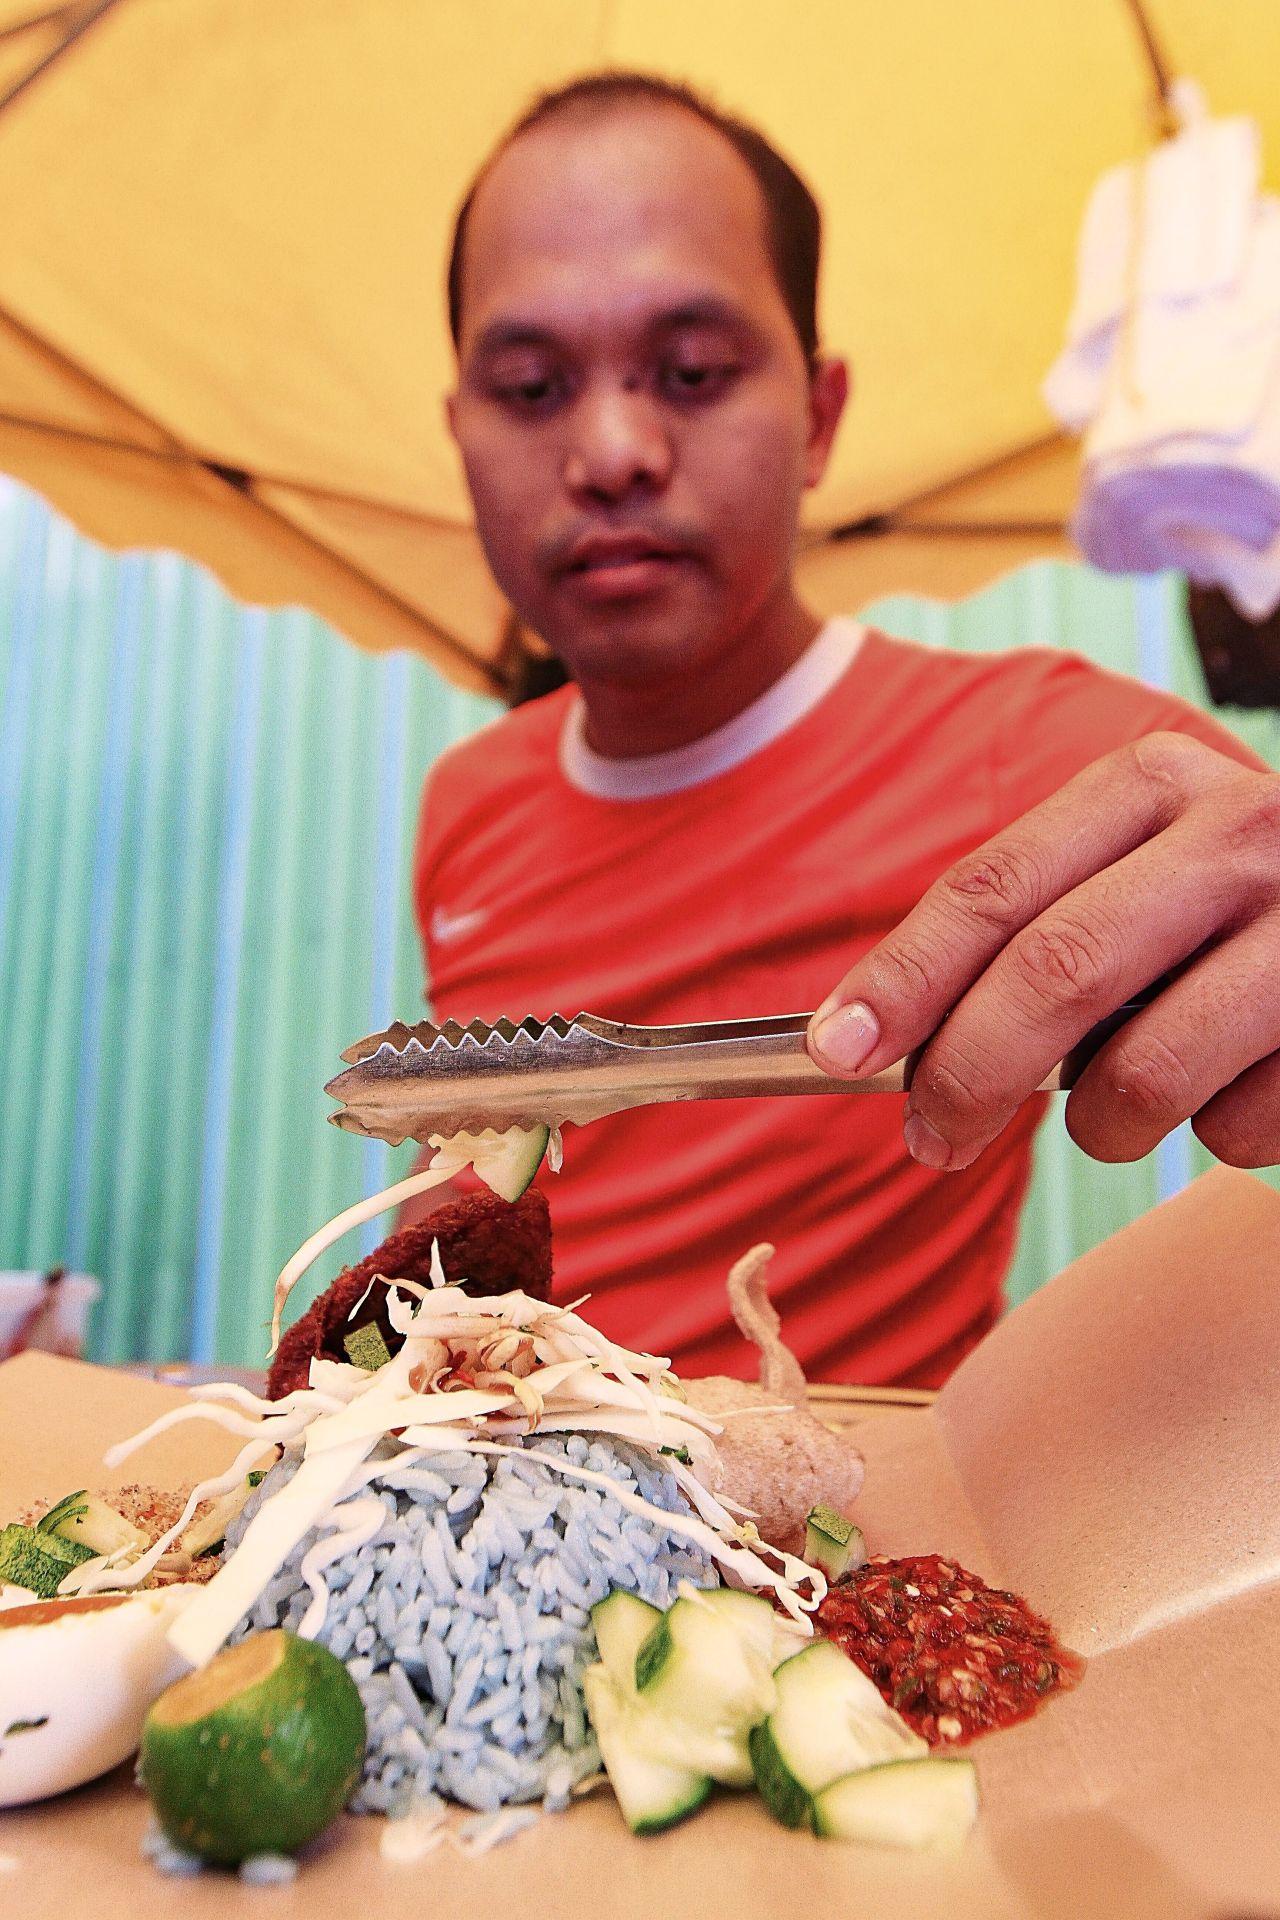 Suhaib putting the last of the garnishing on the nasi kerabu at the stall behind Menara KH in Jalan Sultan Ismail, Kuala Lumpur.